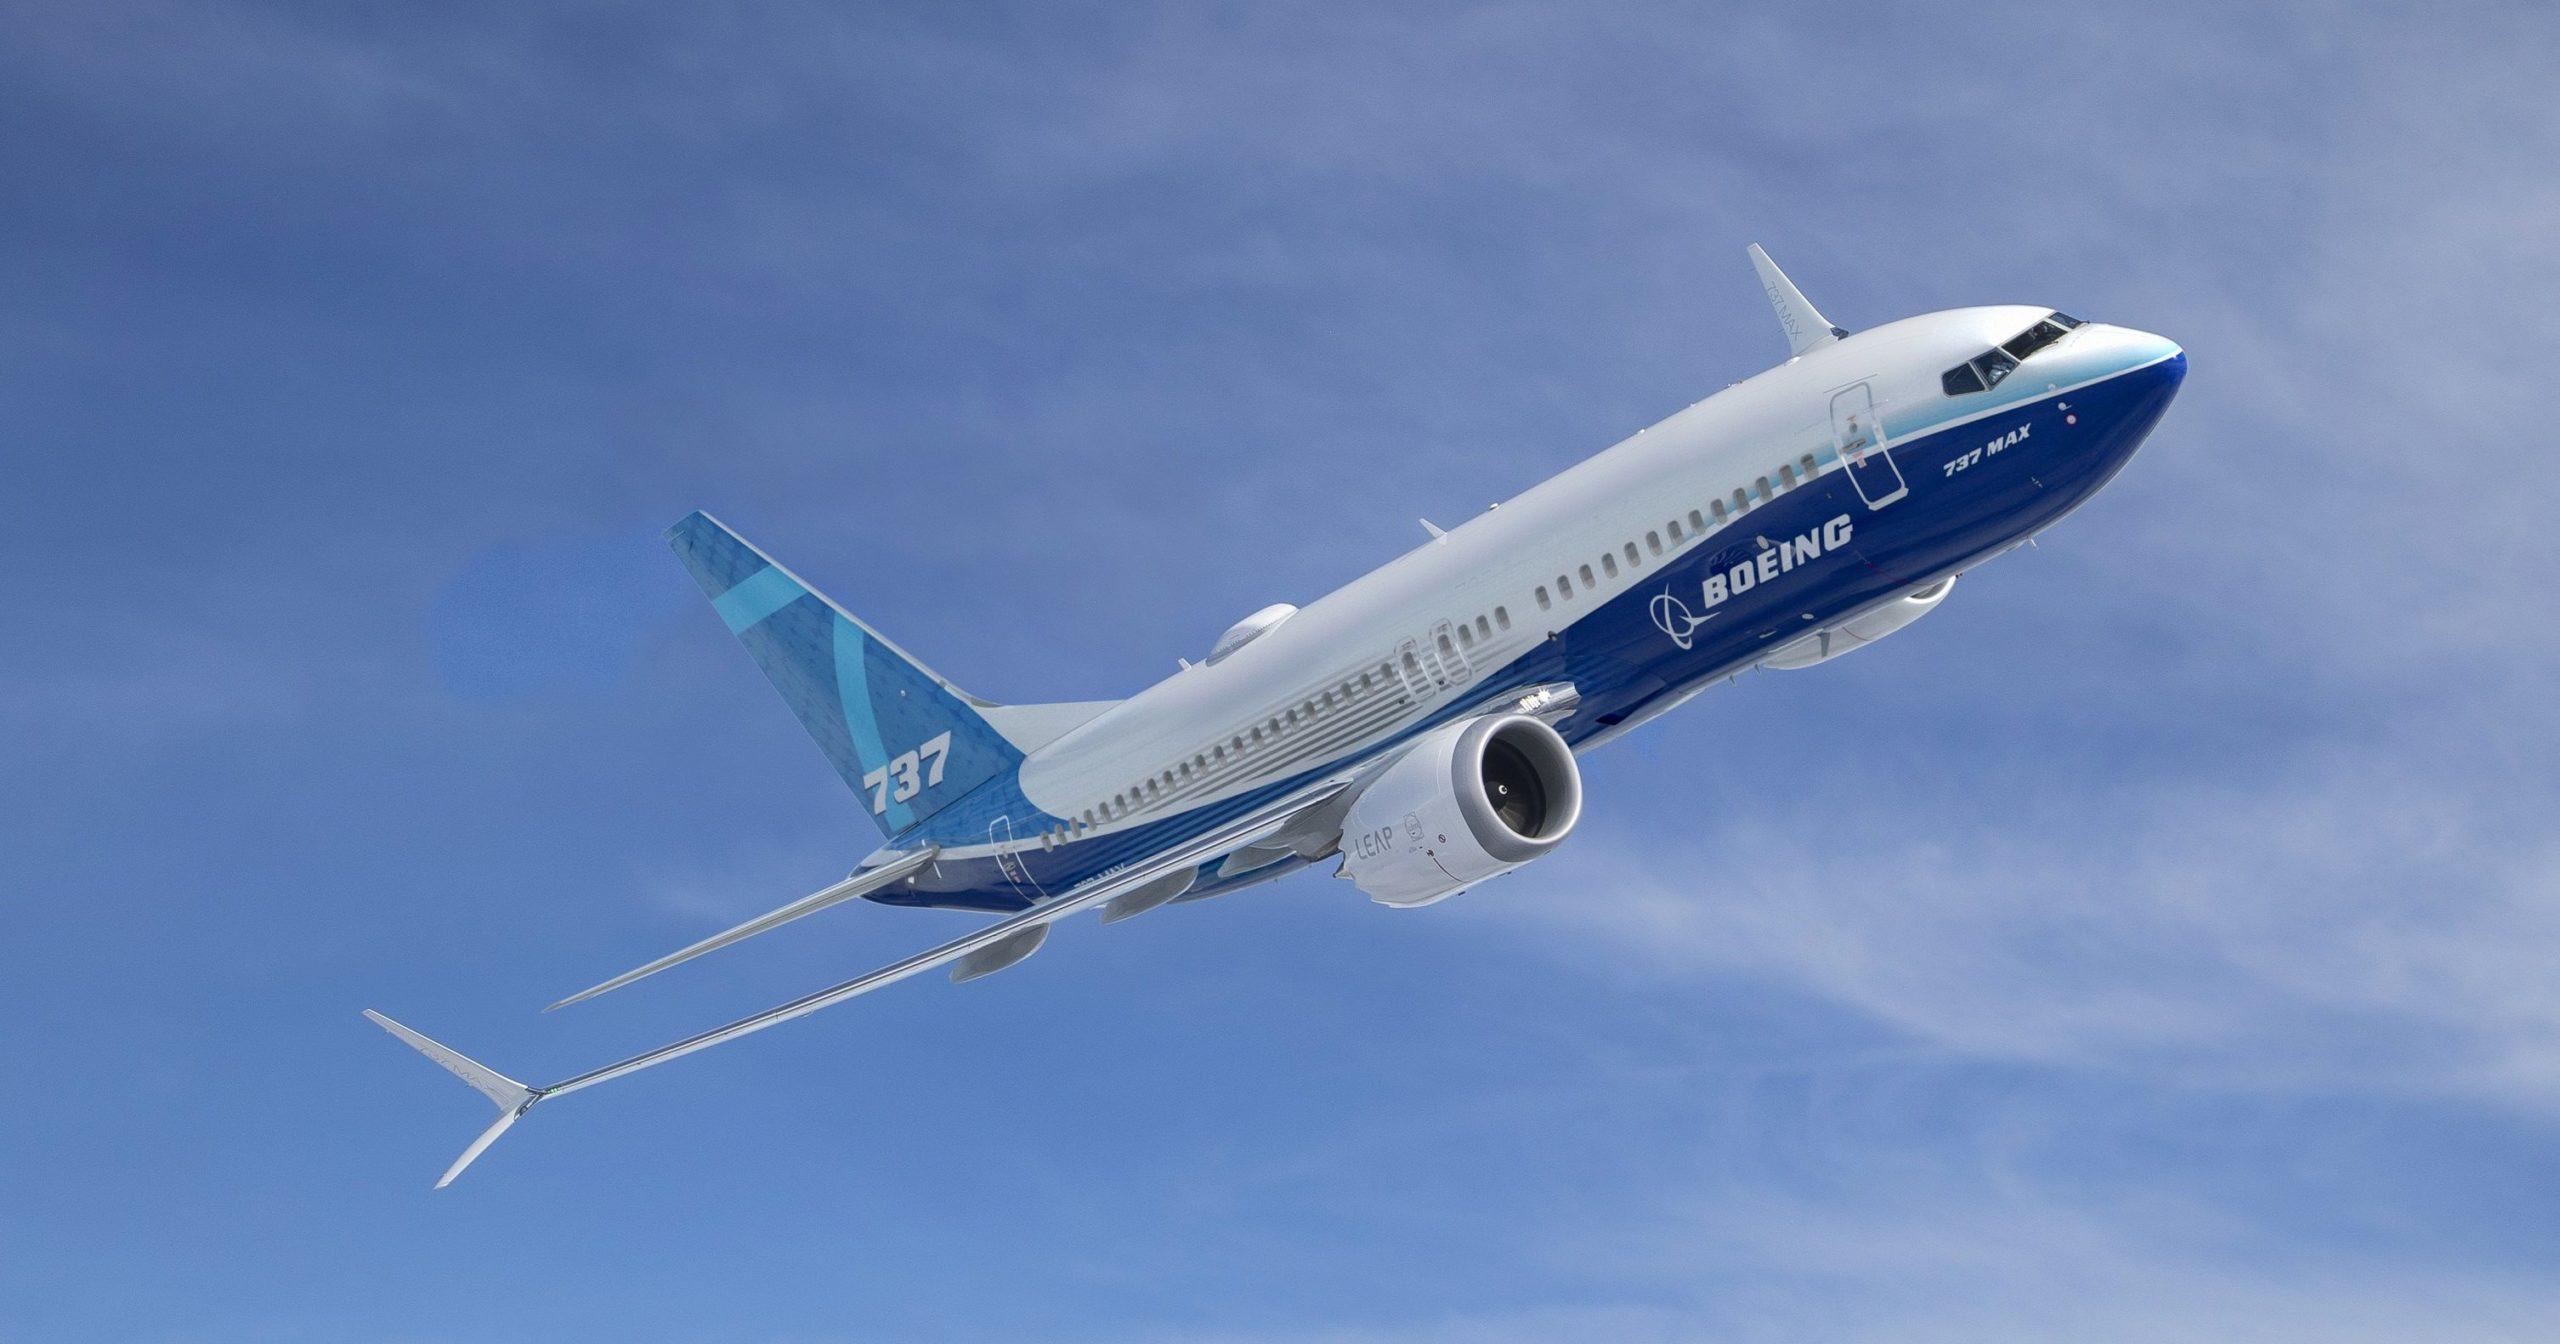 У простаивающих из-за карантина Boeing 737 обнаружена коррозия